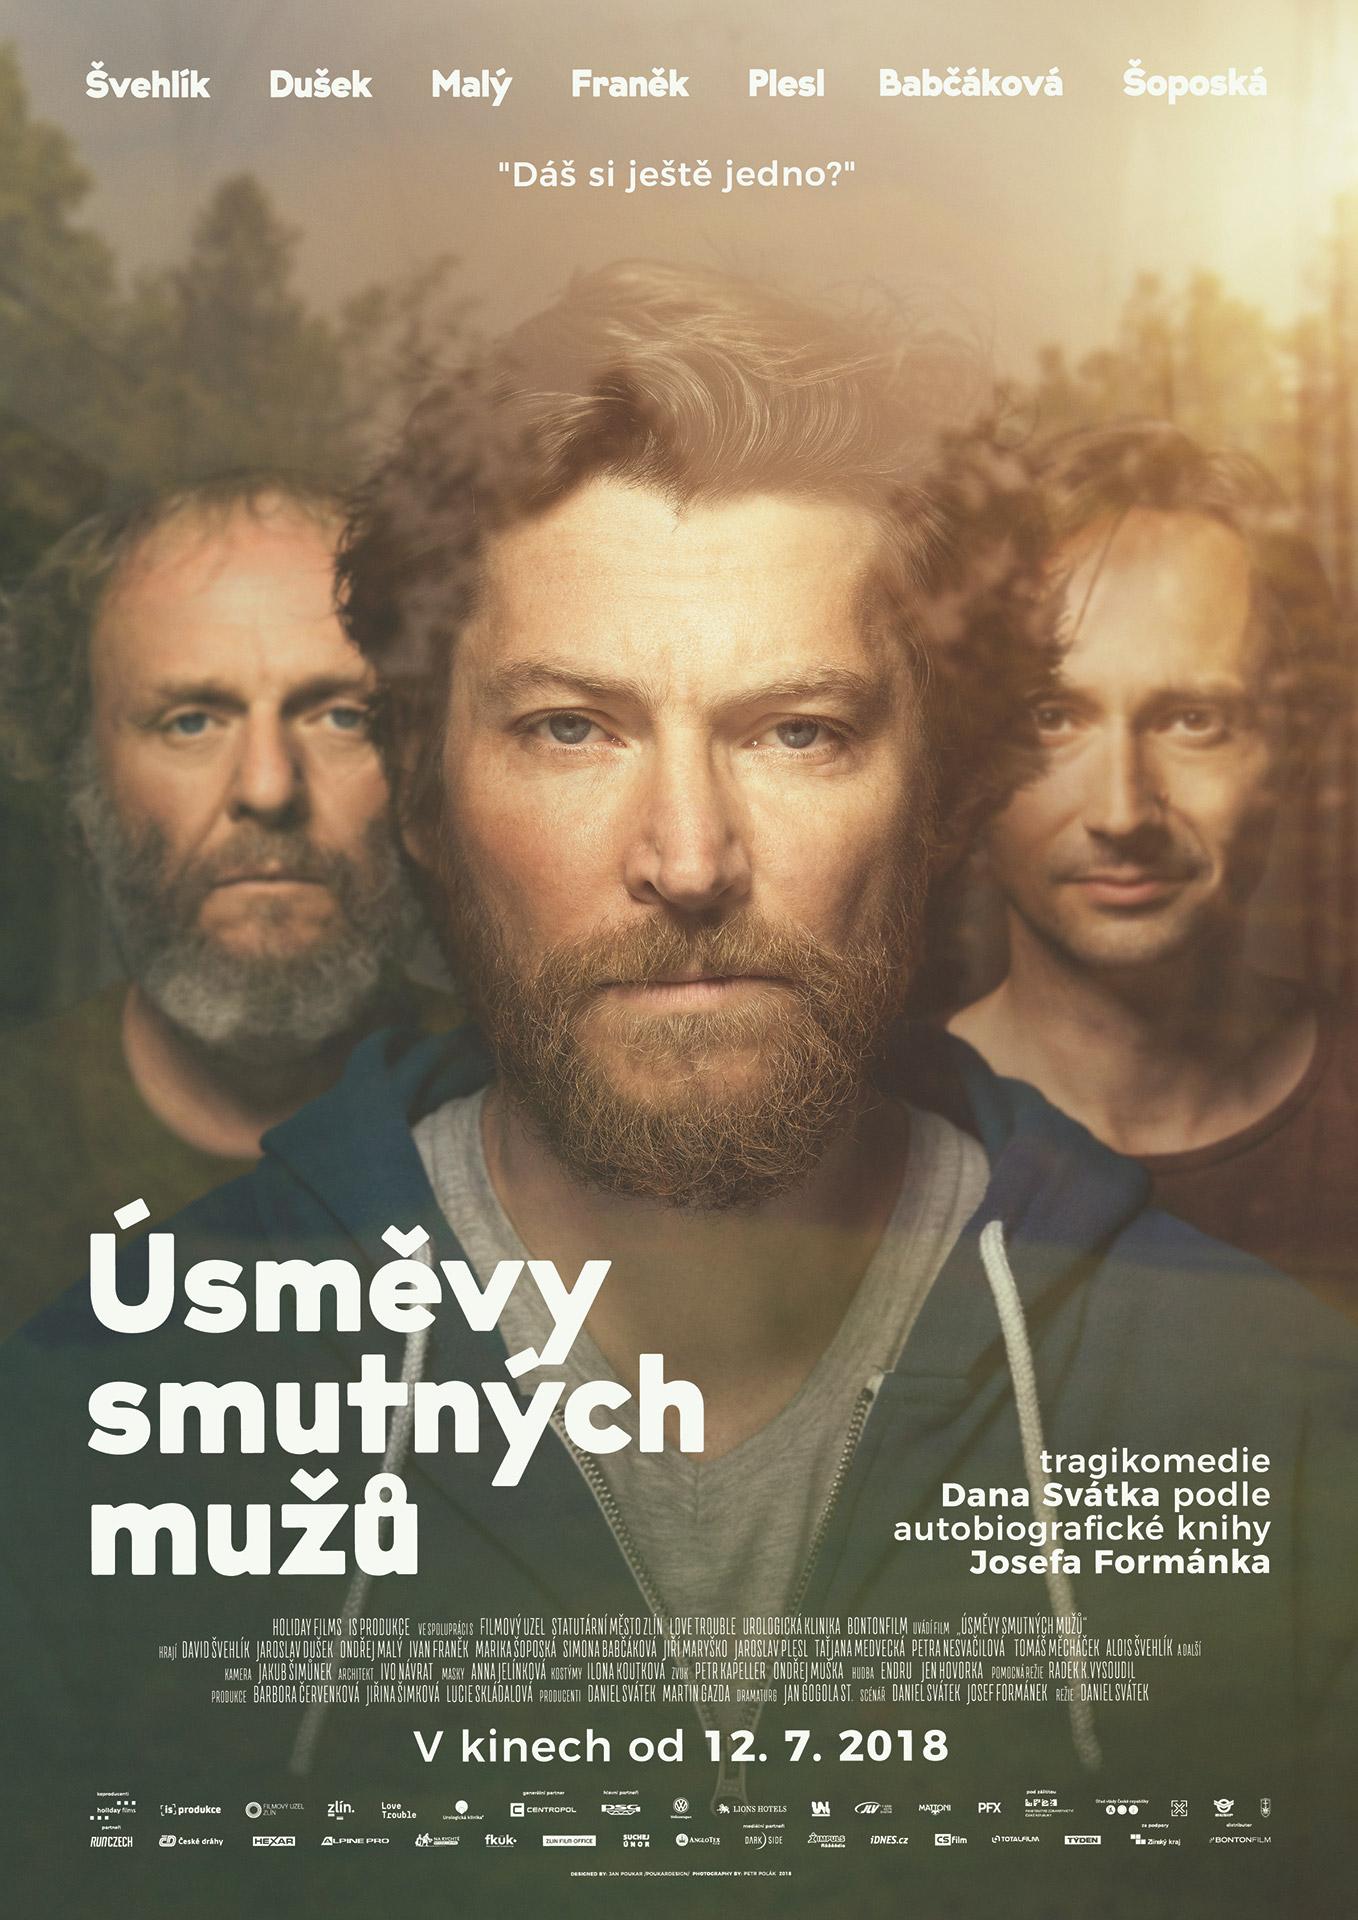 ÚSMĚVY SMUTNÝCH MUŽŮ - filmový plakát